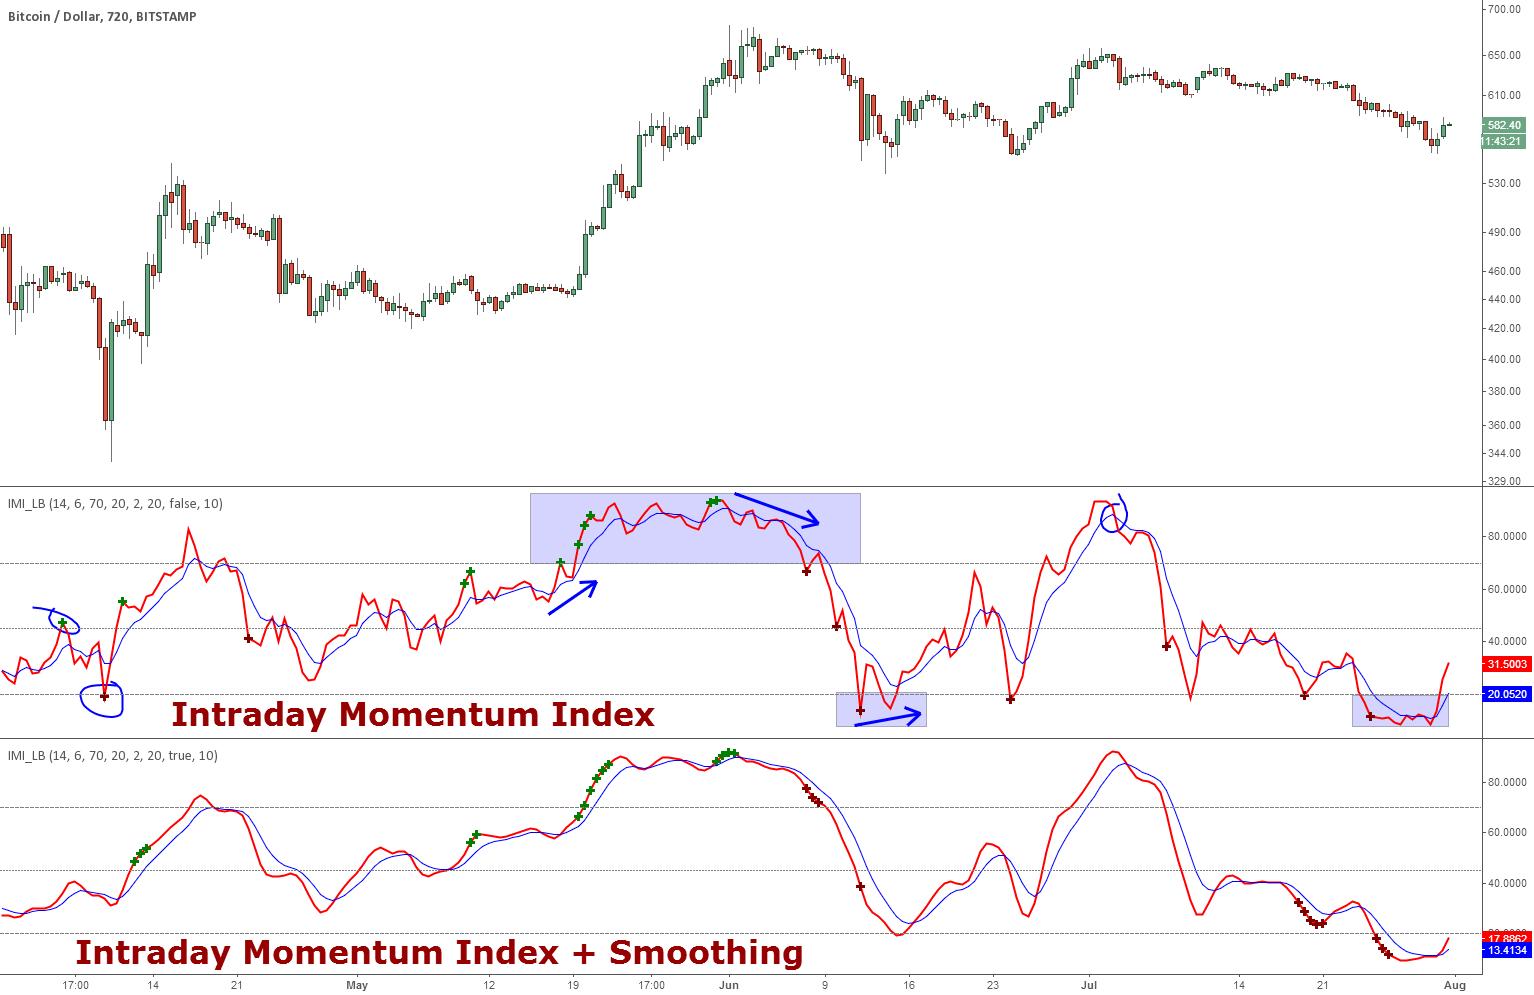 Indicator: Intrady Momentum Index